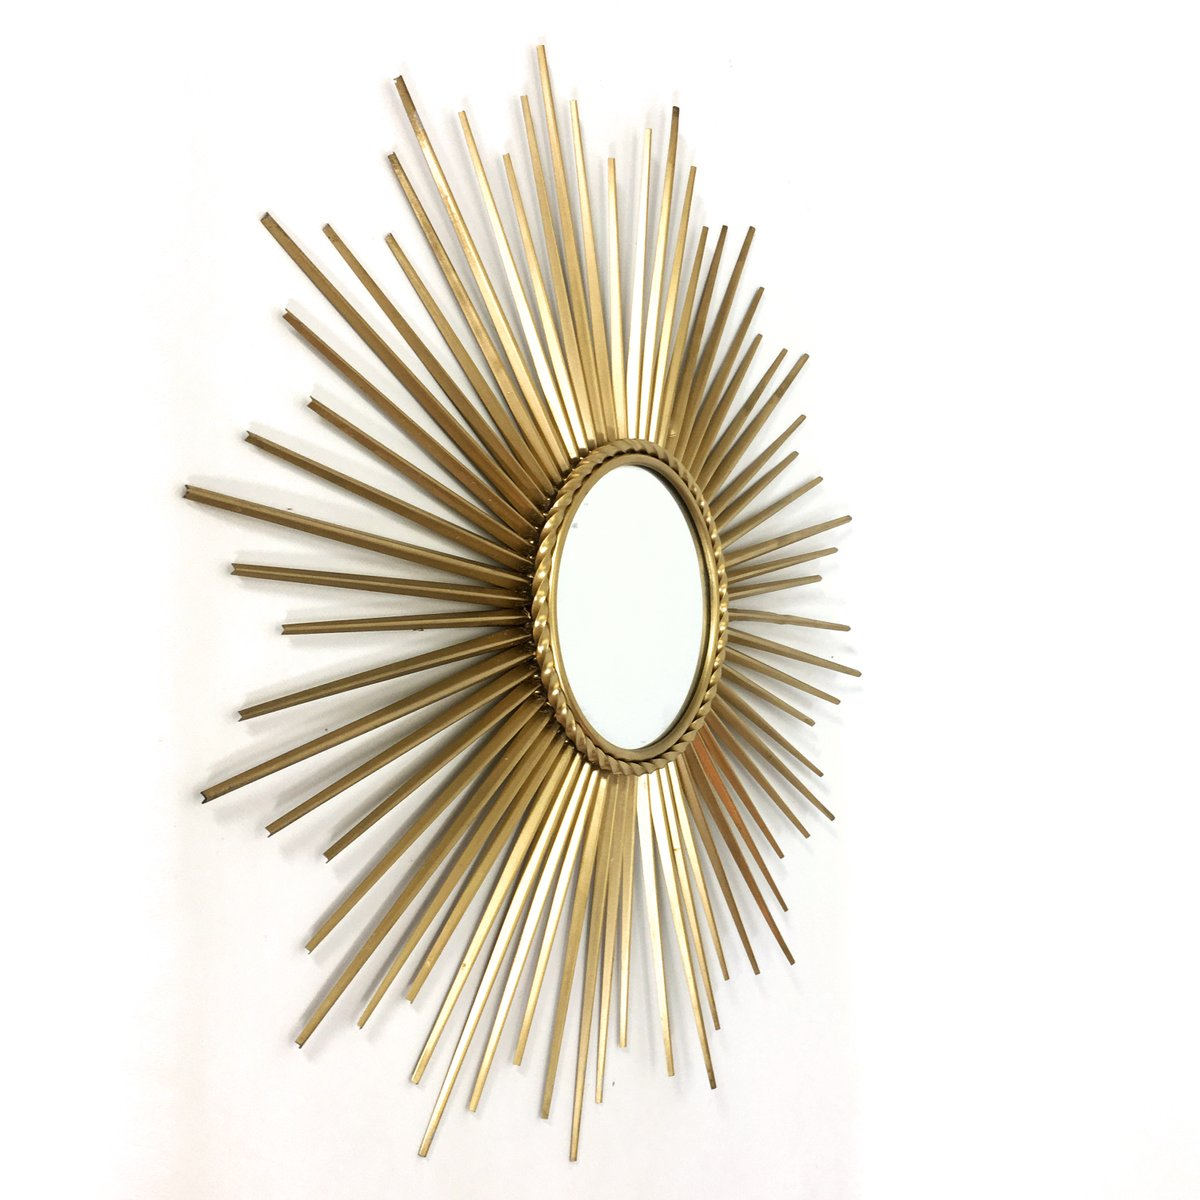 Miroir mid century en forme de soleil dor de chaty for Chaty vallauris miroir